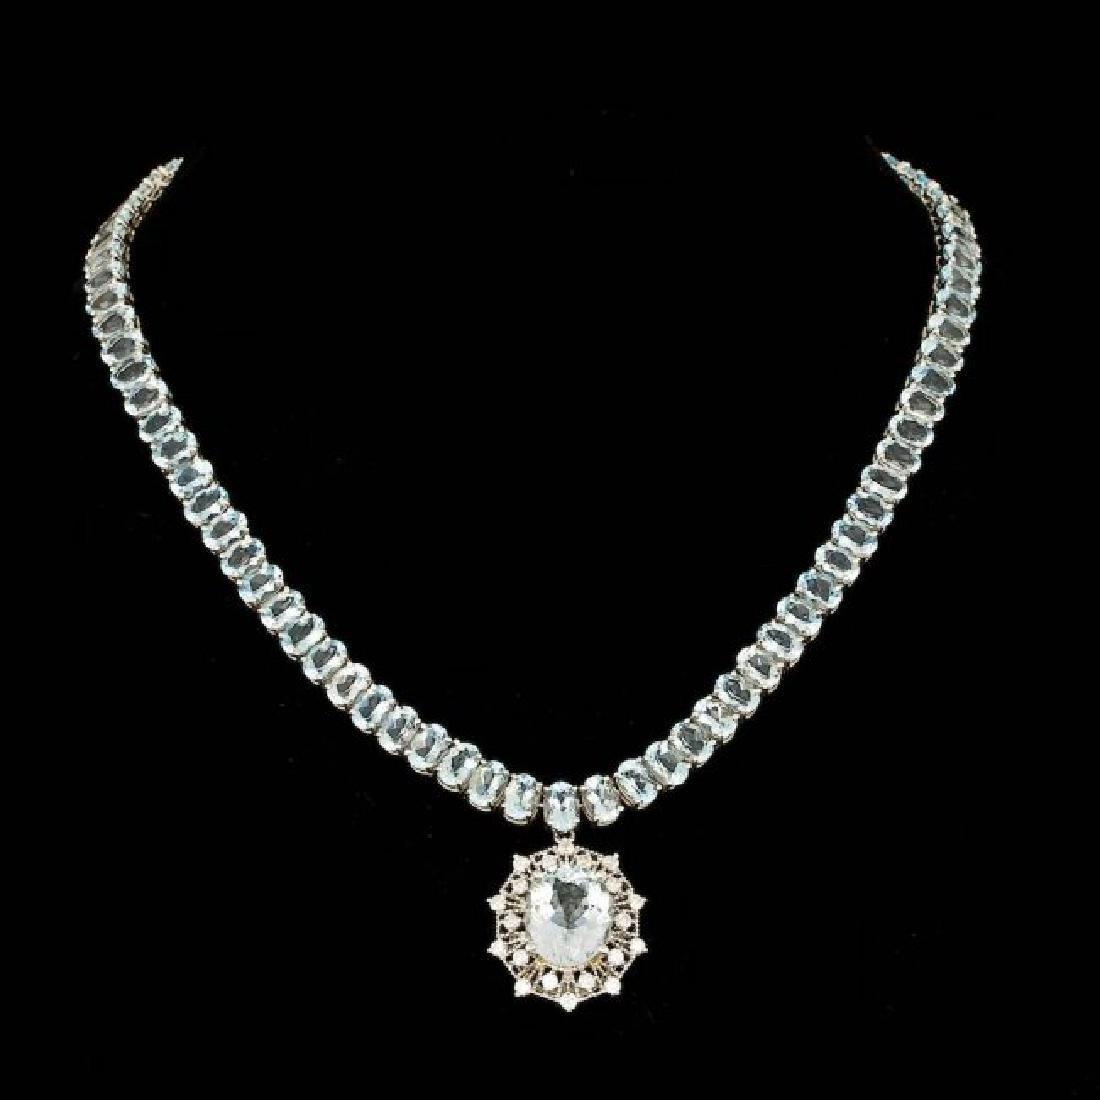 14k Gold 61ct Aquamarine 1.40ct Diamond Necklace - 2